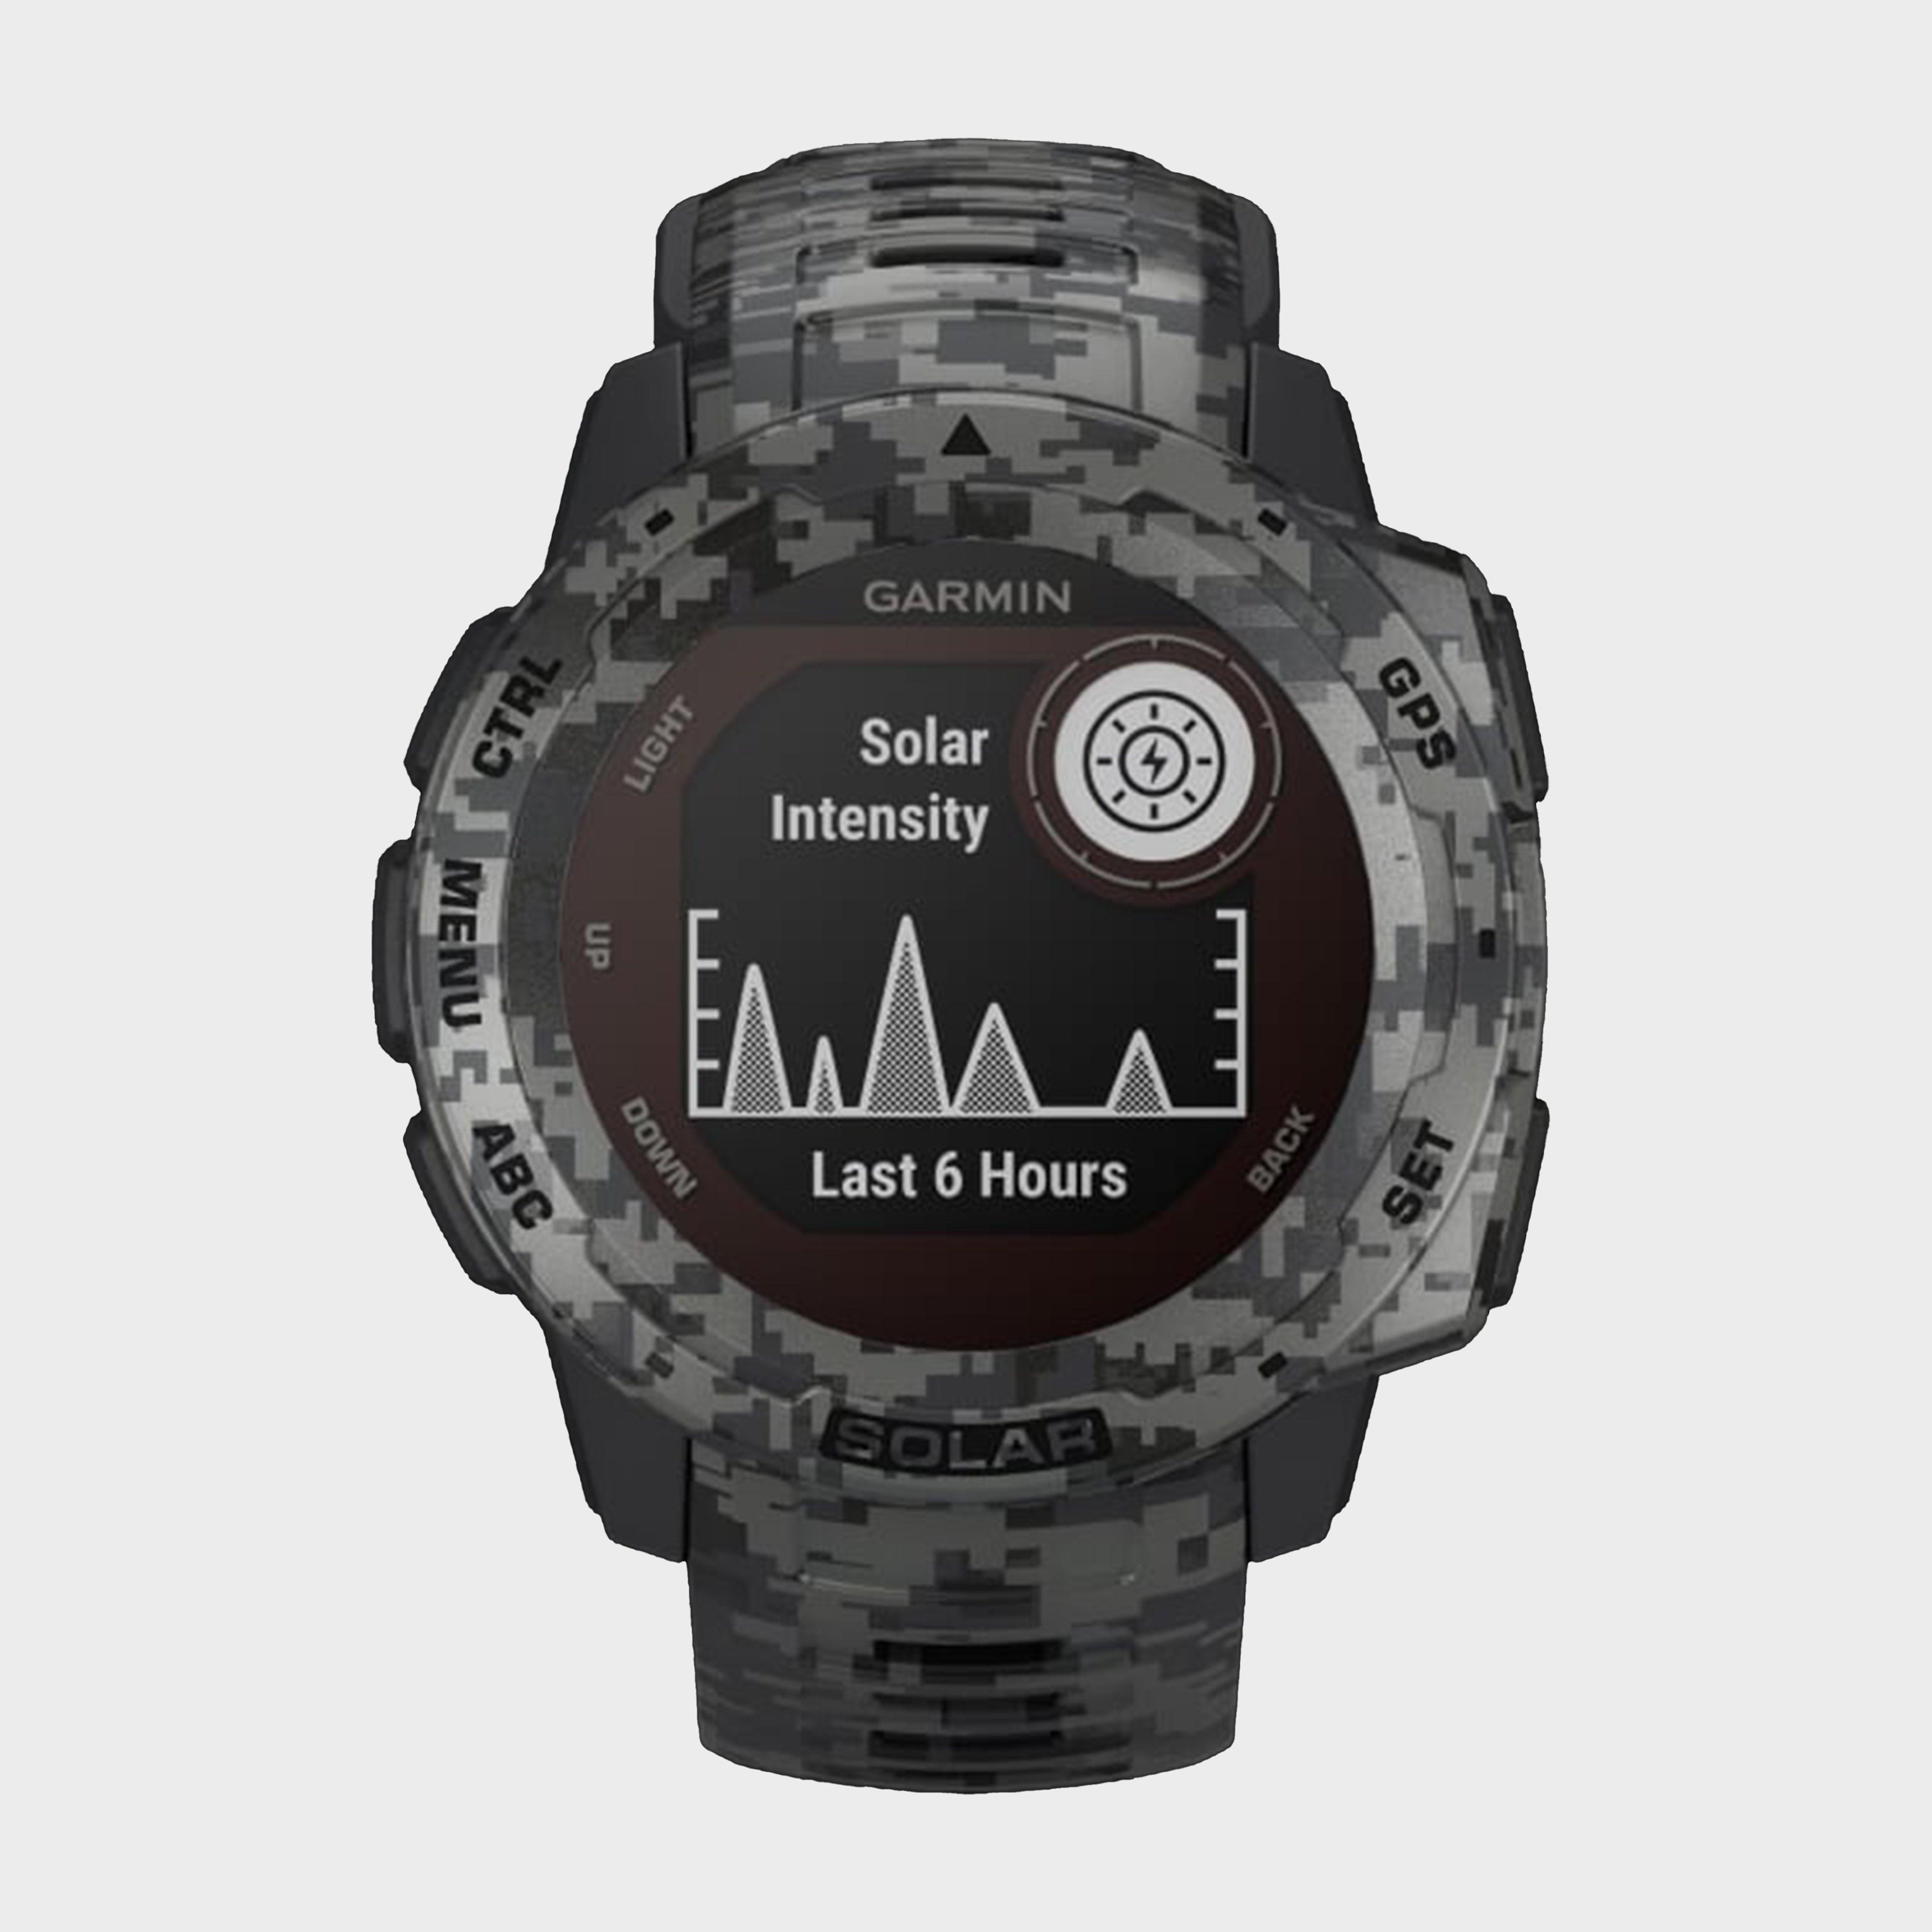 Garmin Instinct Solar Camo Edition Multi-Sport Gps Watch - Grey/Black, Grey/Black